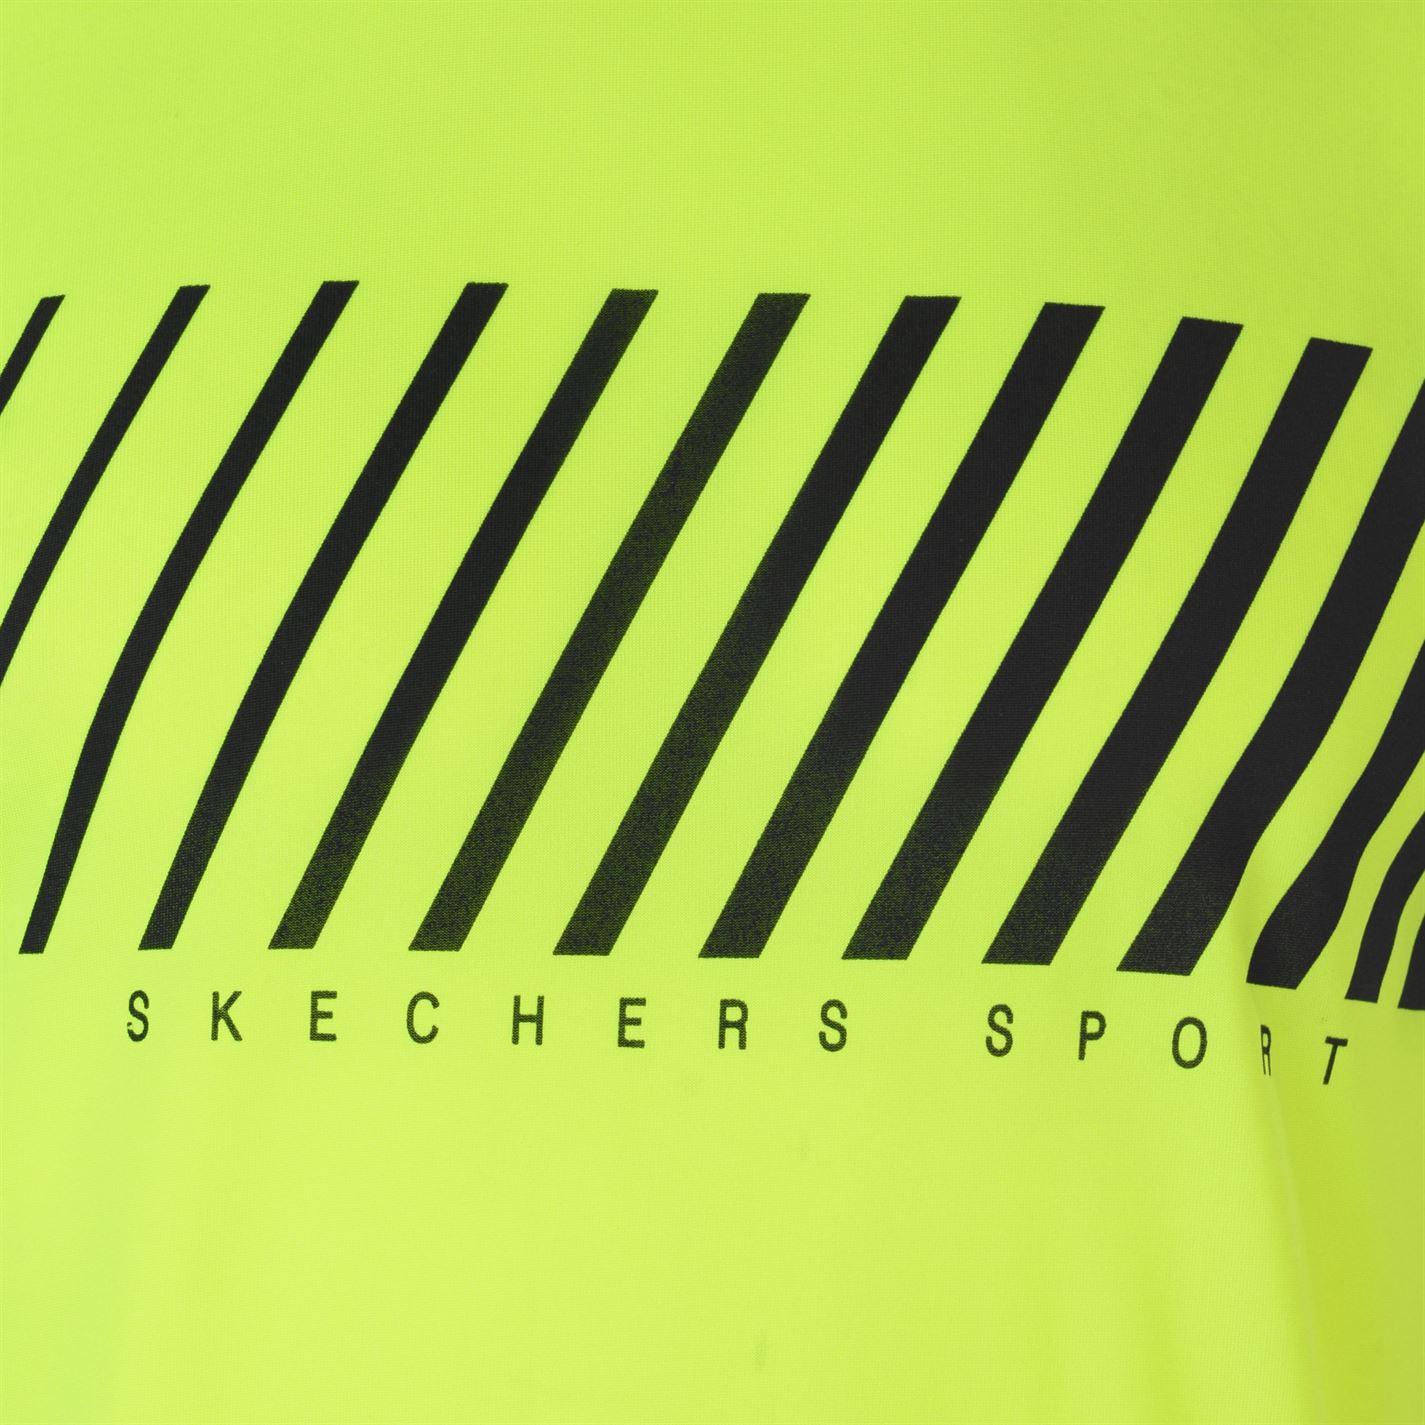 Skechers-Mens-Rendimiento-Grafico-camiseta-Manga-Corta-Camiseta-Top-Cuello-Redondo miniatura 16